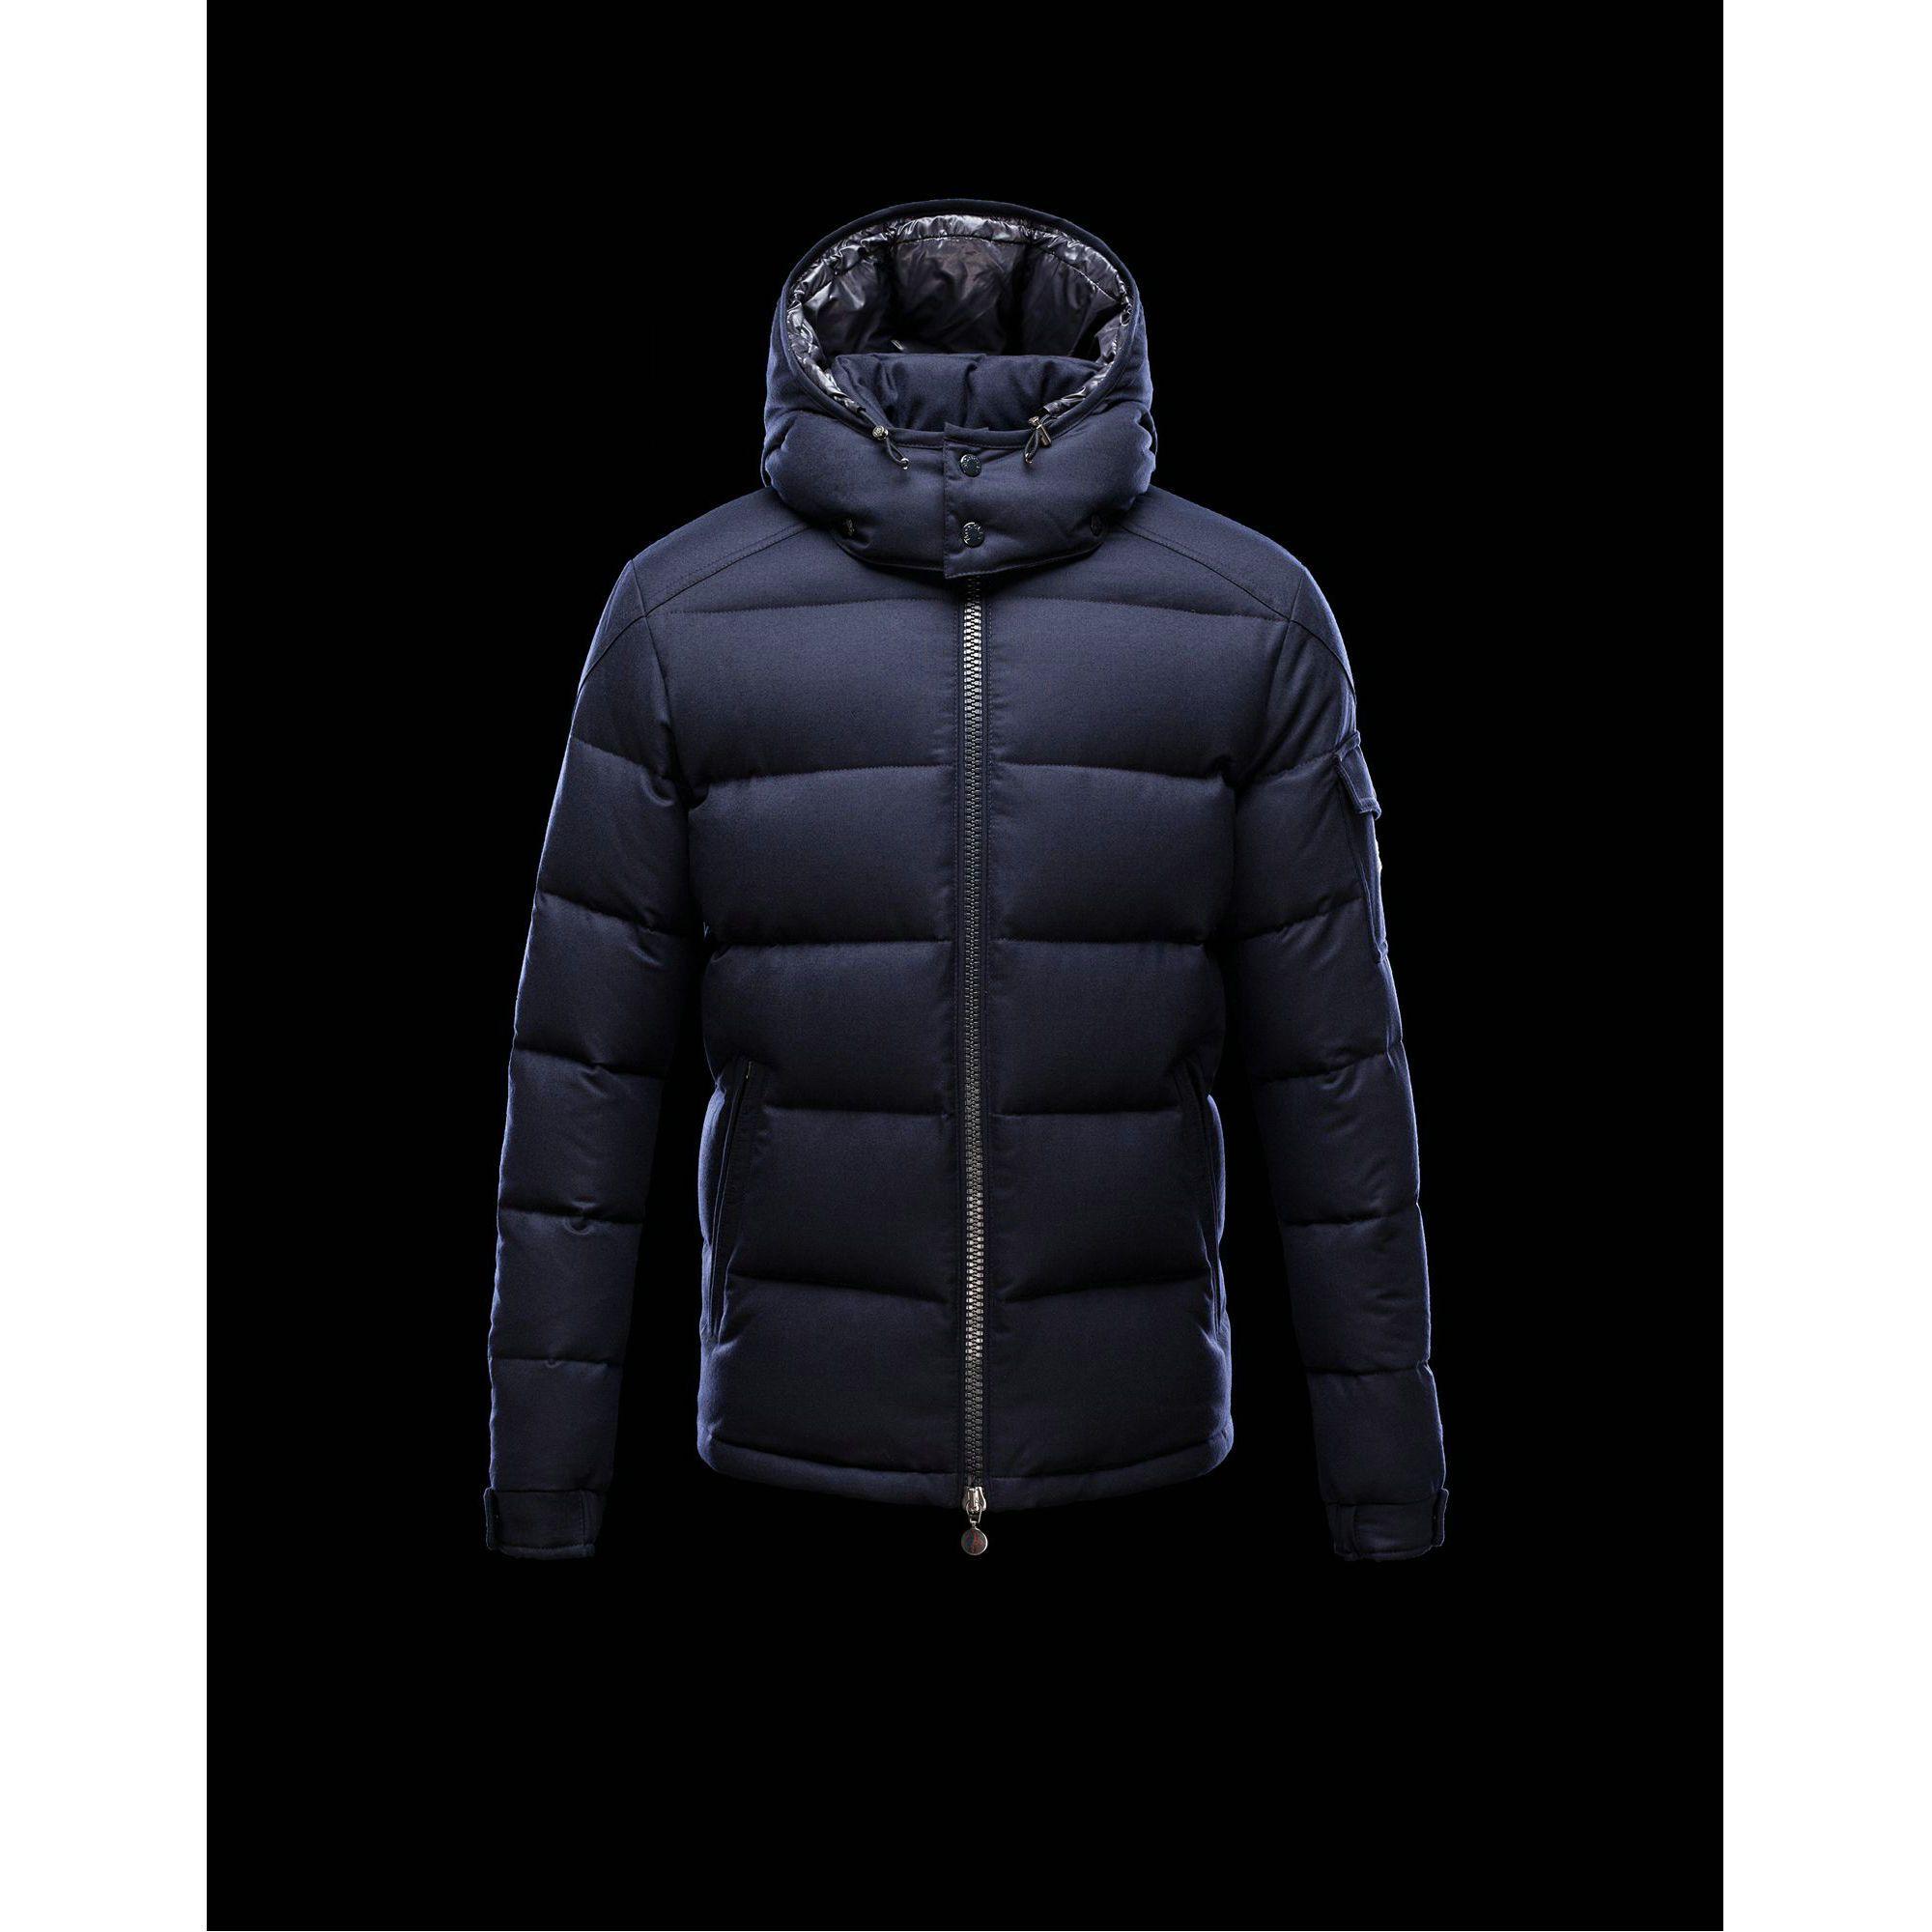 2015 New! Moncler Montgenevre Winter Jackets For Men Blue